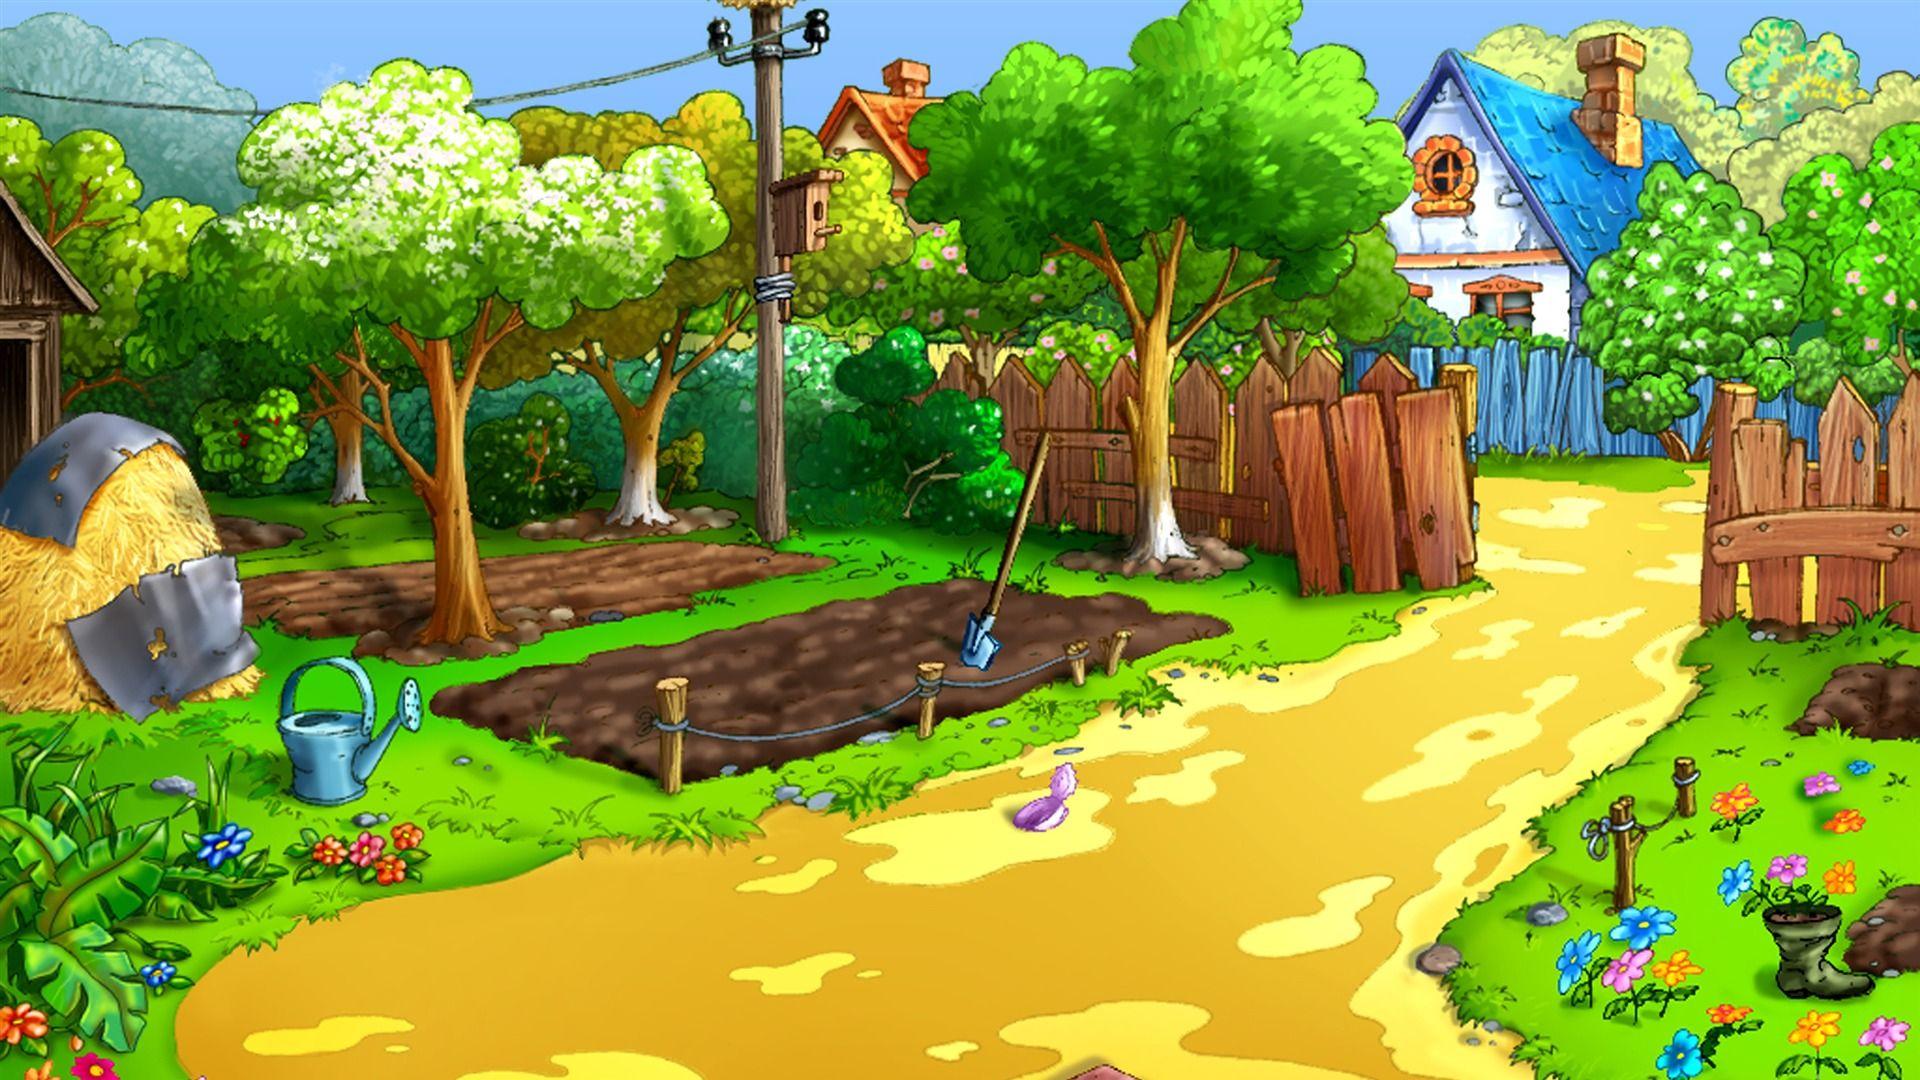 Cartoon Nature Wallpapers - Cartoon Farm Background Hd - HD Wallpaper